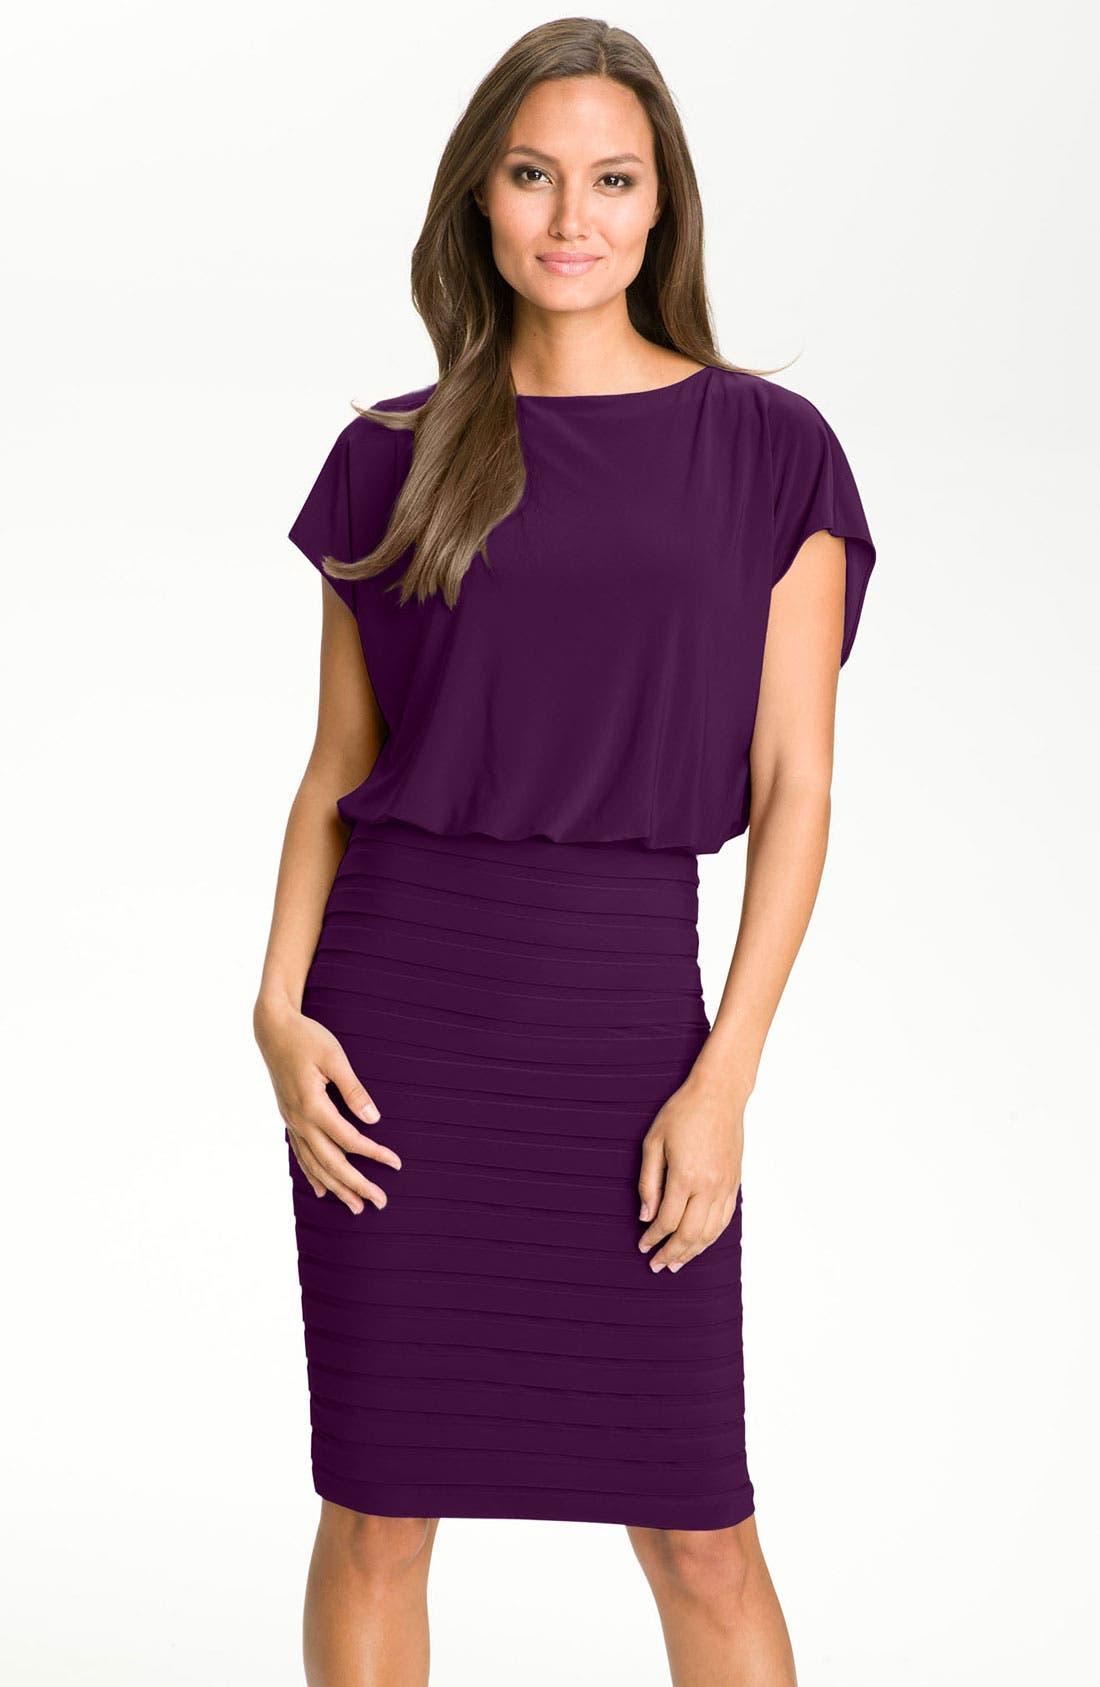 Alternate Image 1 Selected - Adrianna Papell Blouson Shutter Pleat Jersey Dress